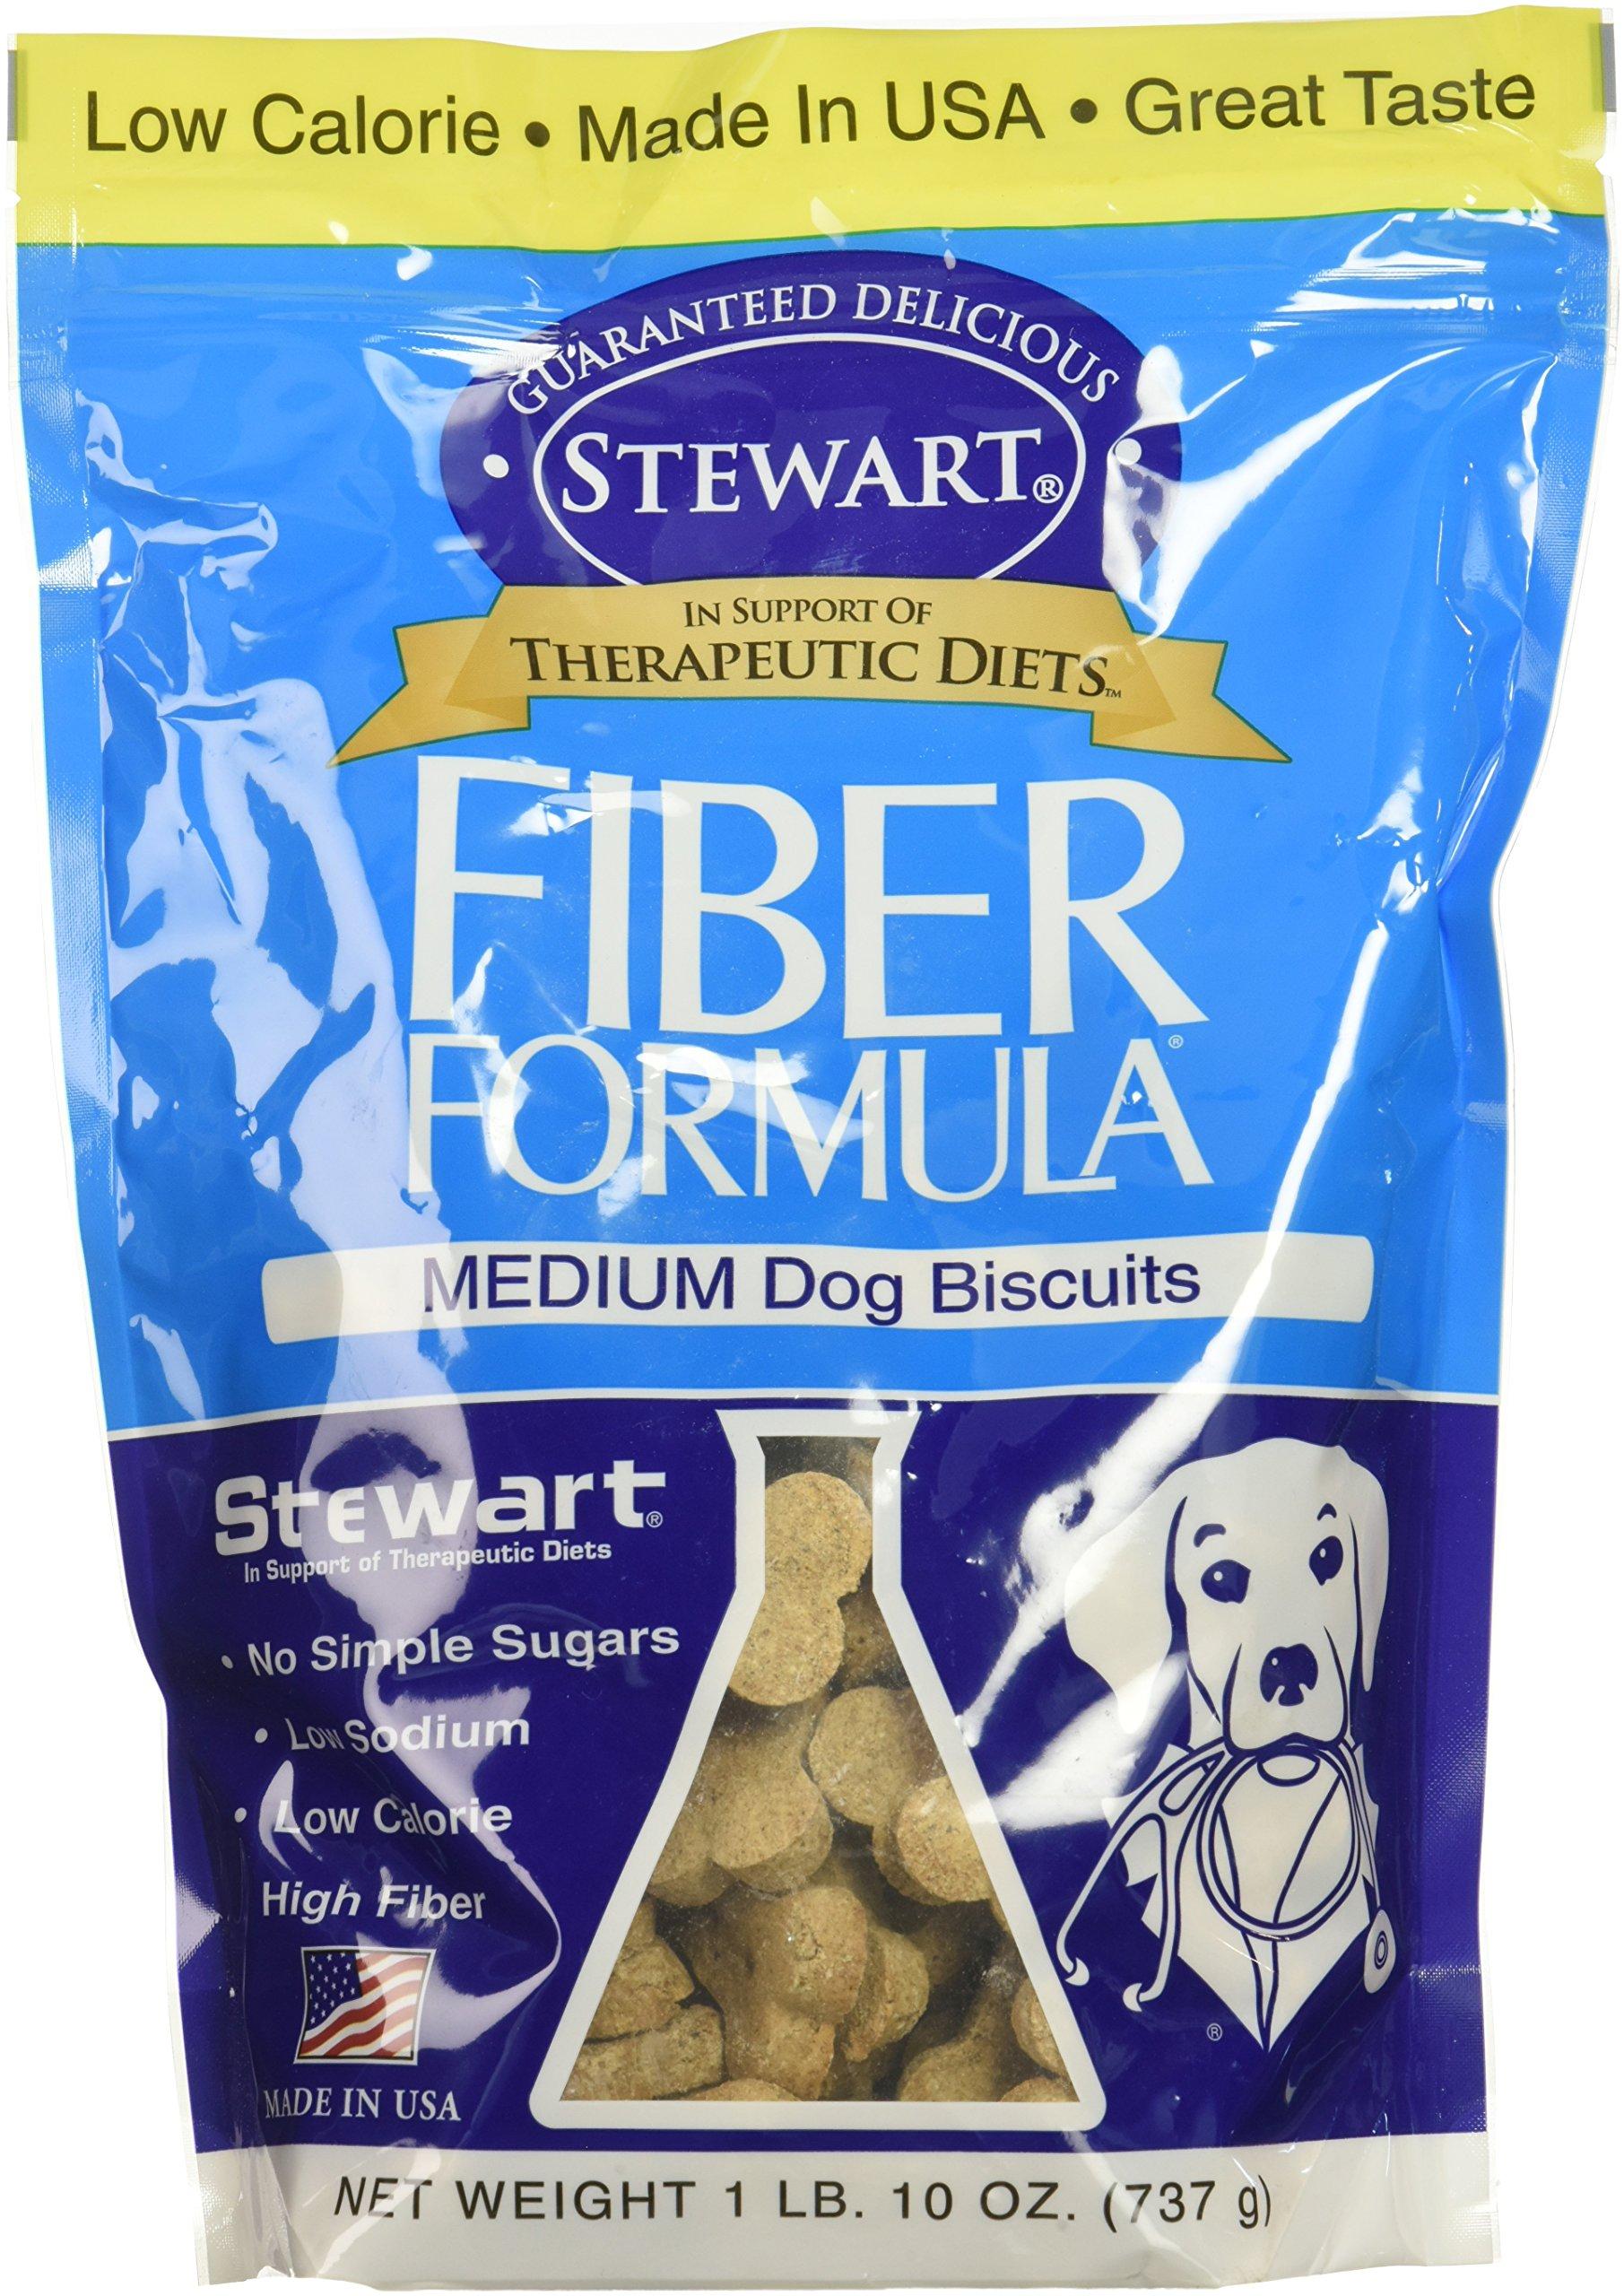 Stewarts Fiber Formula Medium Dog Biscuits - 26 oz.